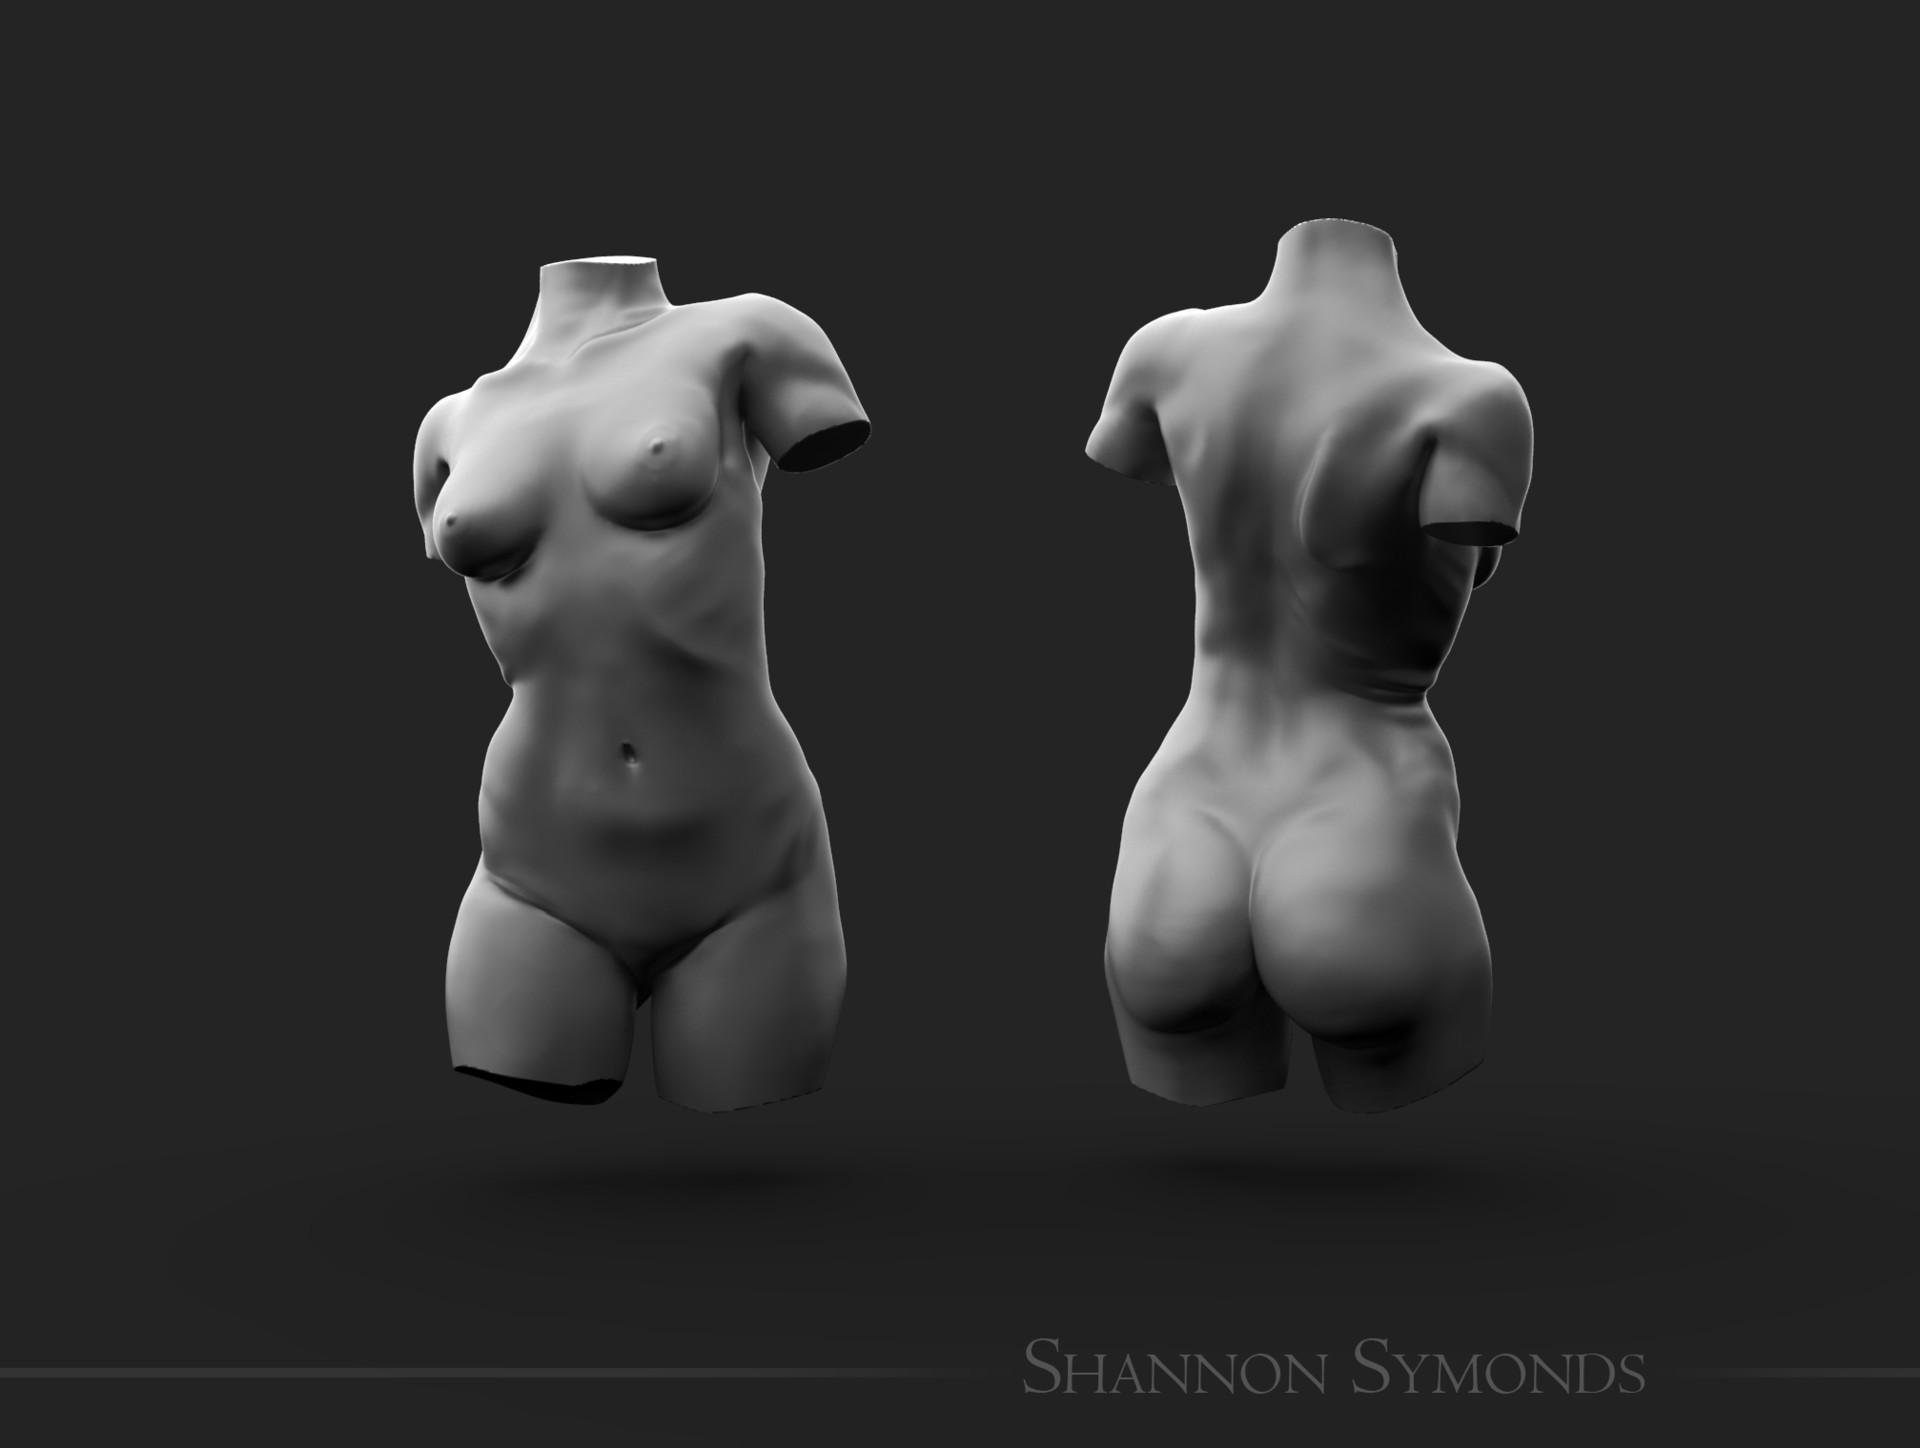 Shannon symonds female twist